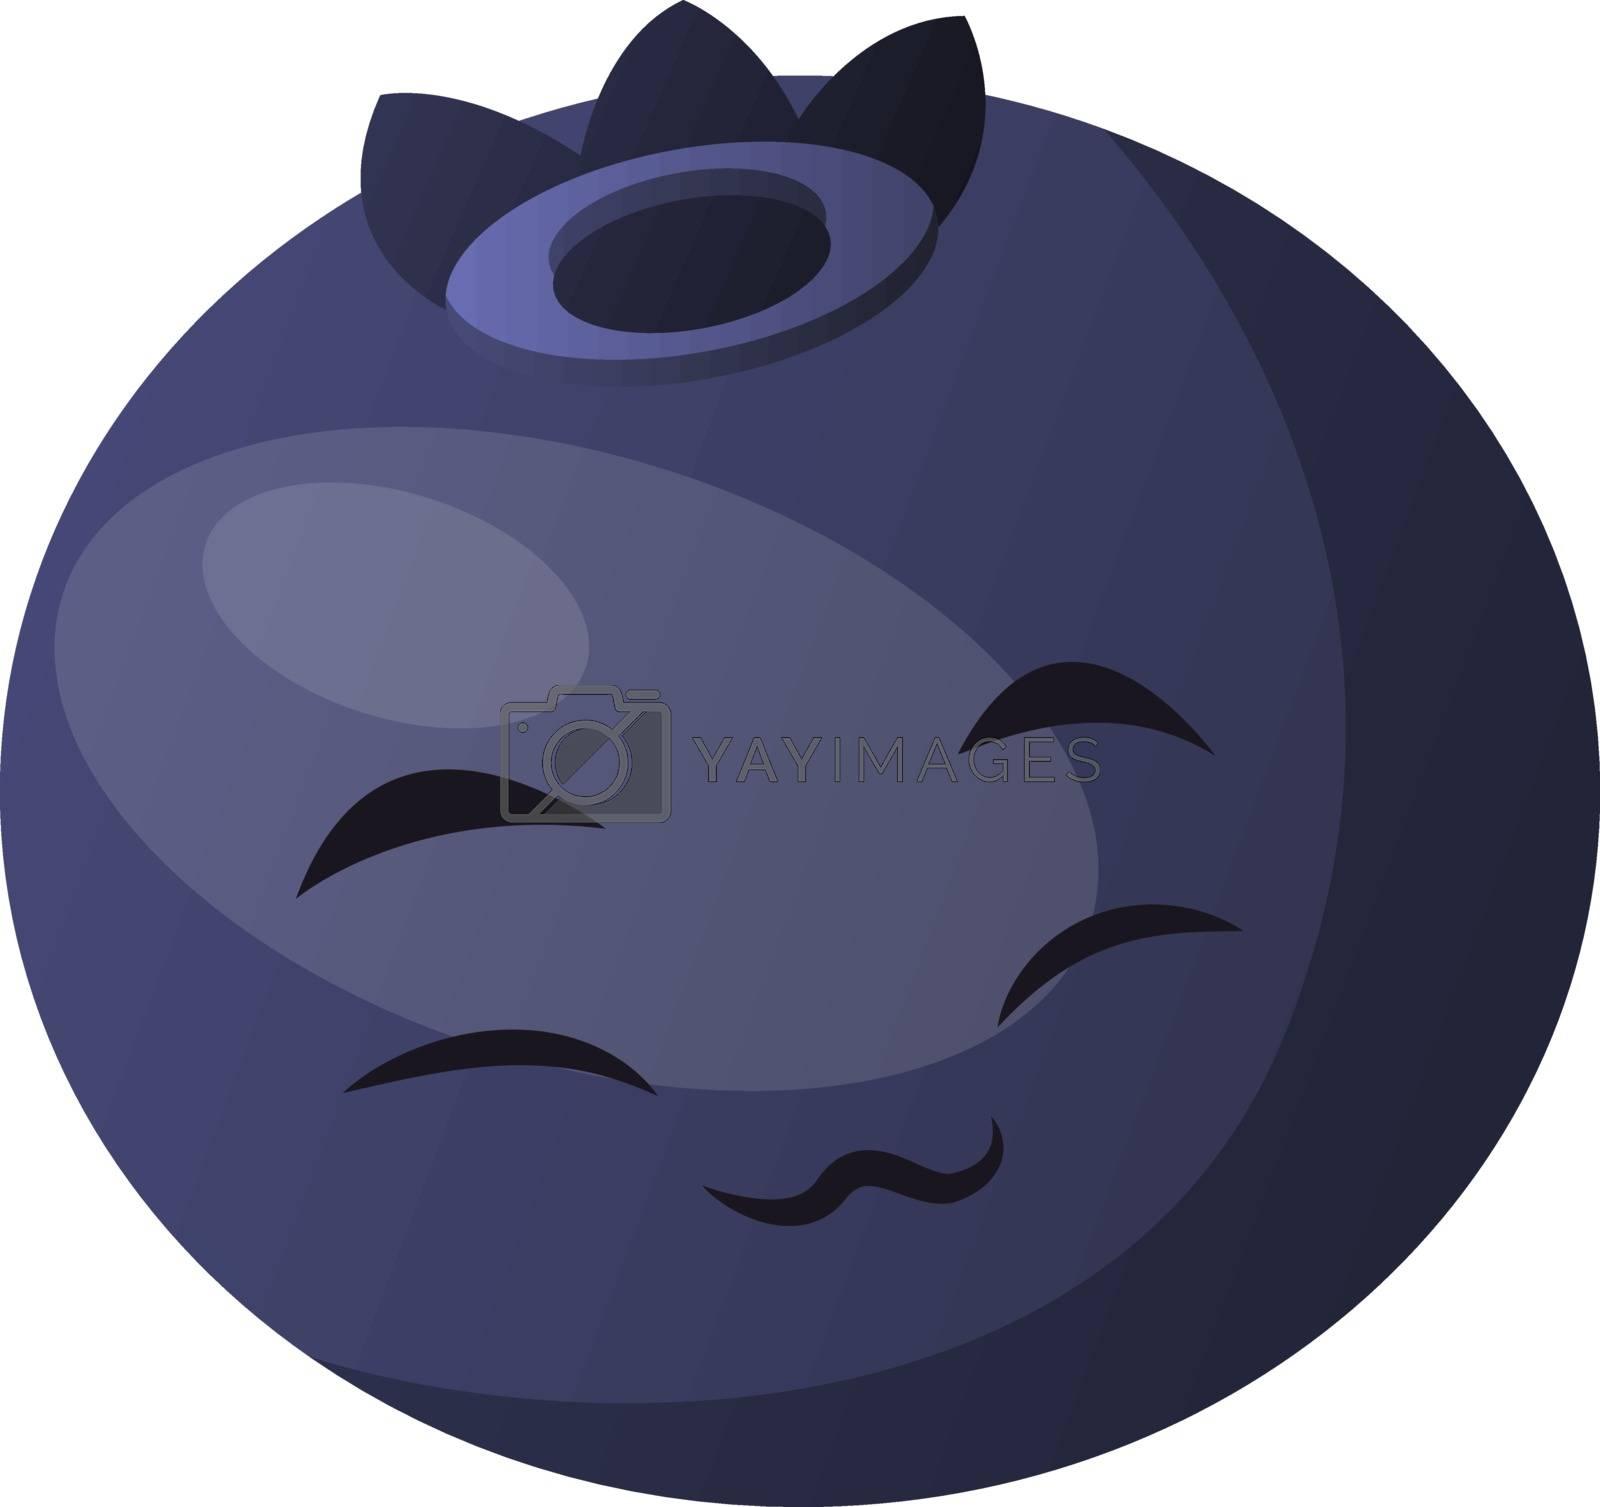 Royalty free image of Blueberry closed eyes enjoying illustration vector on white back by Morphart